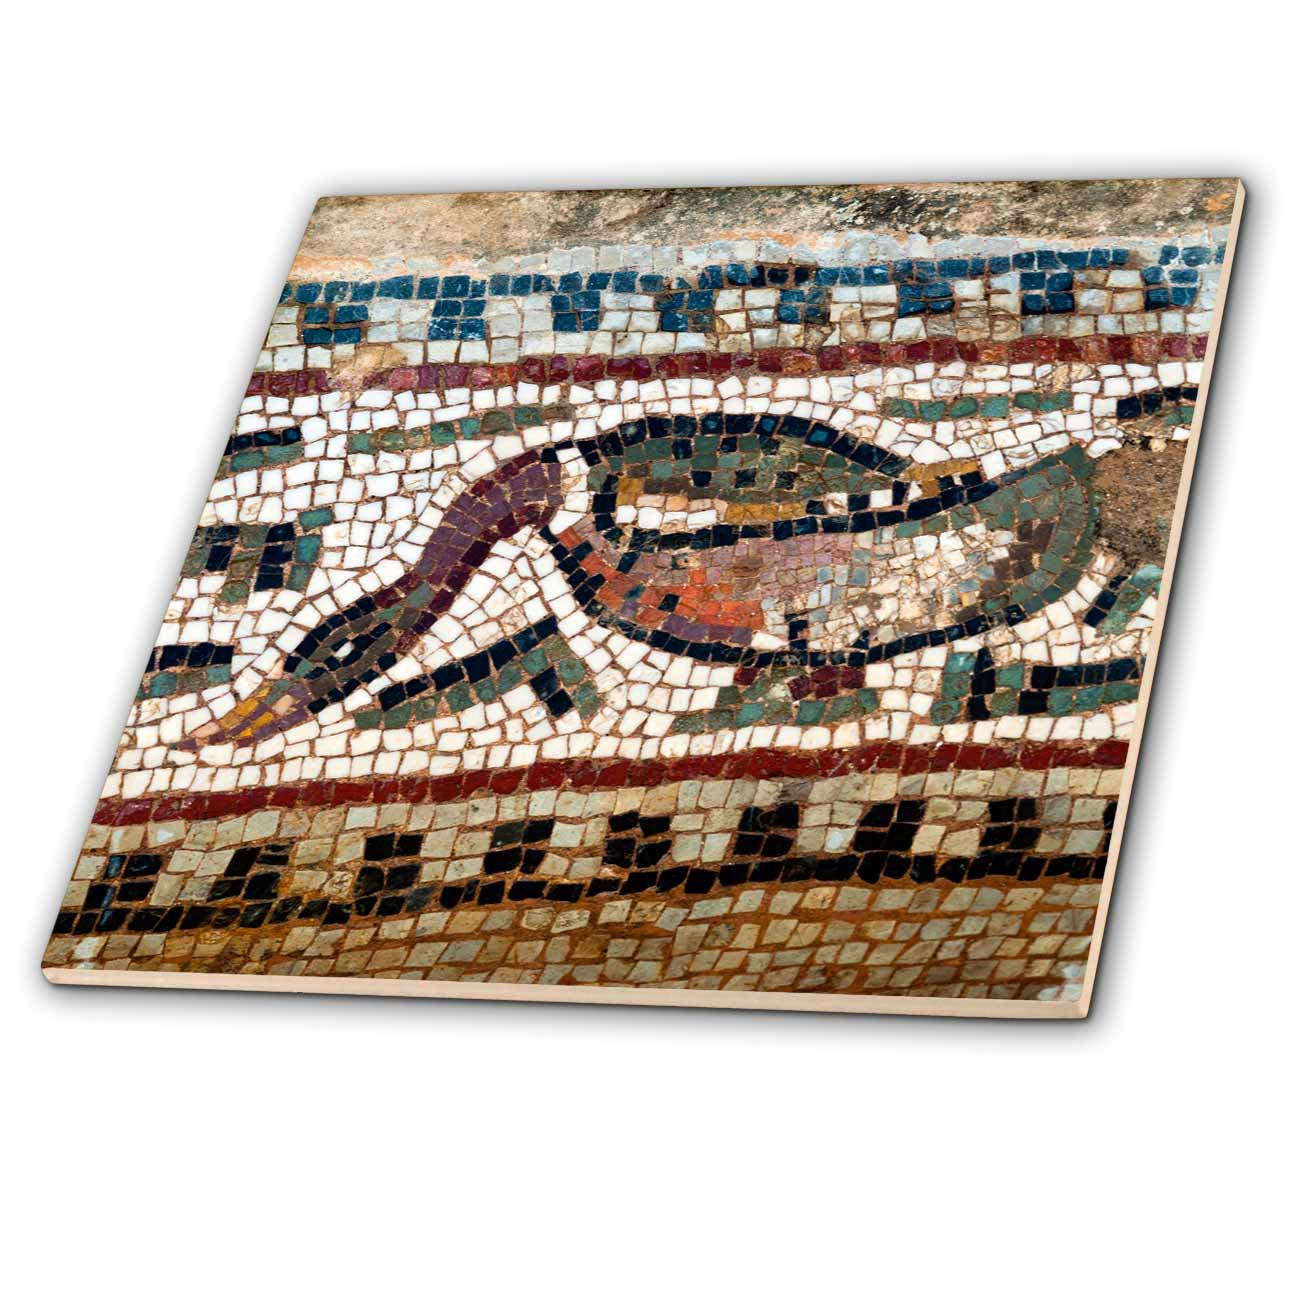 3dRose Danita Delimont - Artwork - Detail of the Amphitrite Roman mosaic, House of Amphitrite, Tunisia - 6 Inch Glass Tile (ct_276620_6)